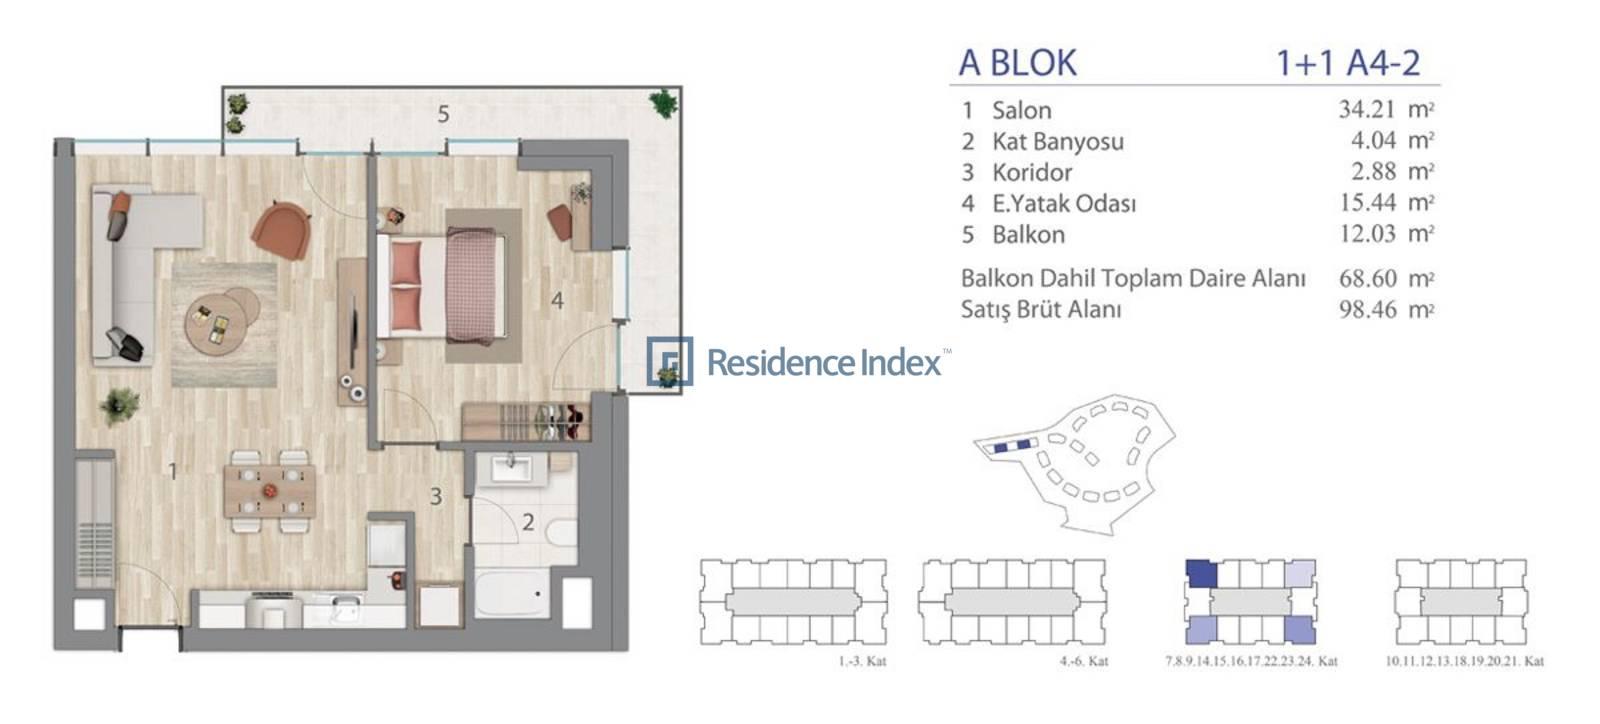 5.LEVENT A Blok A4-2